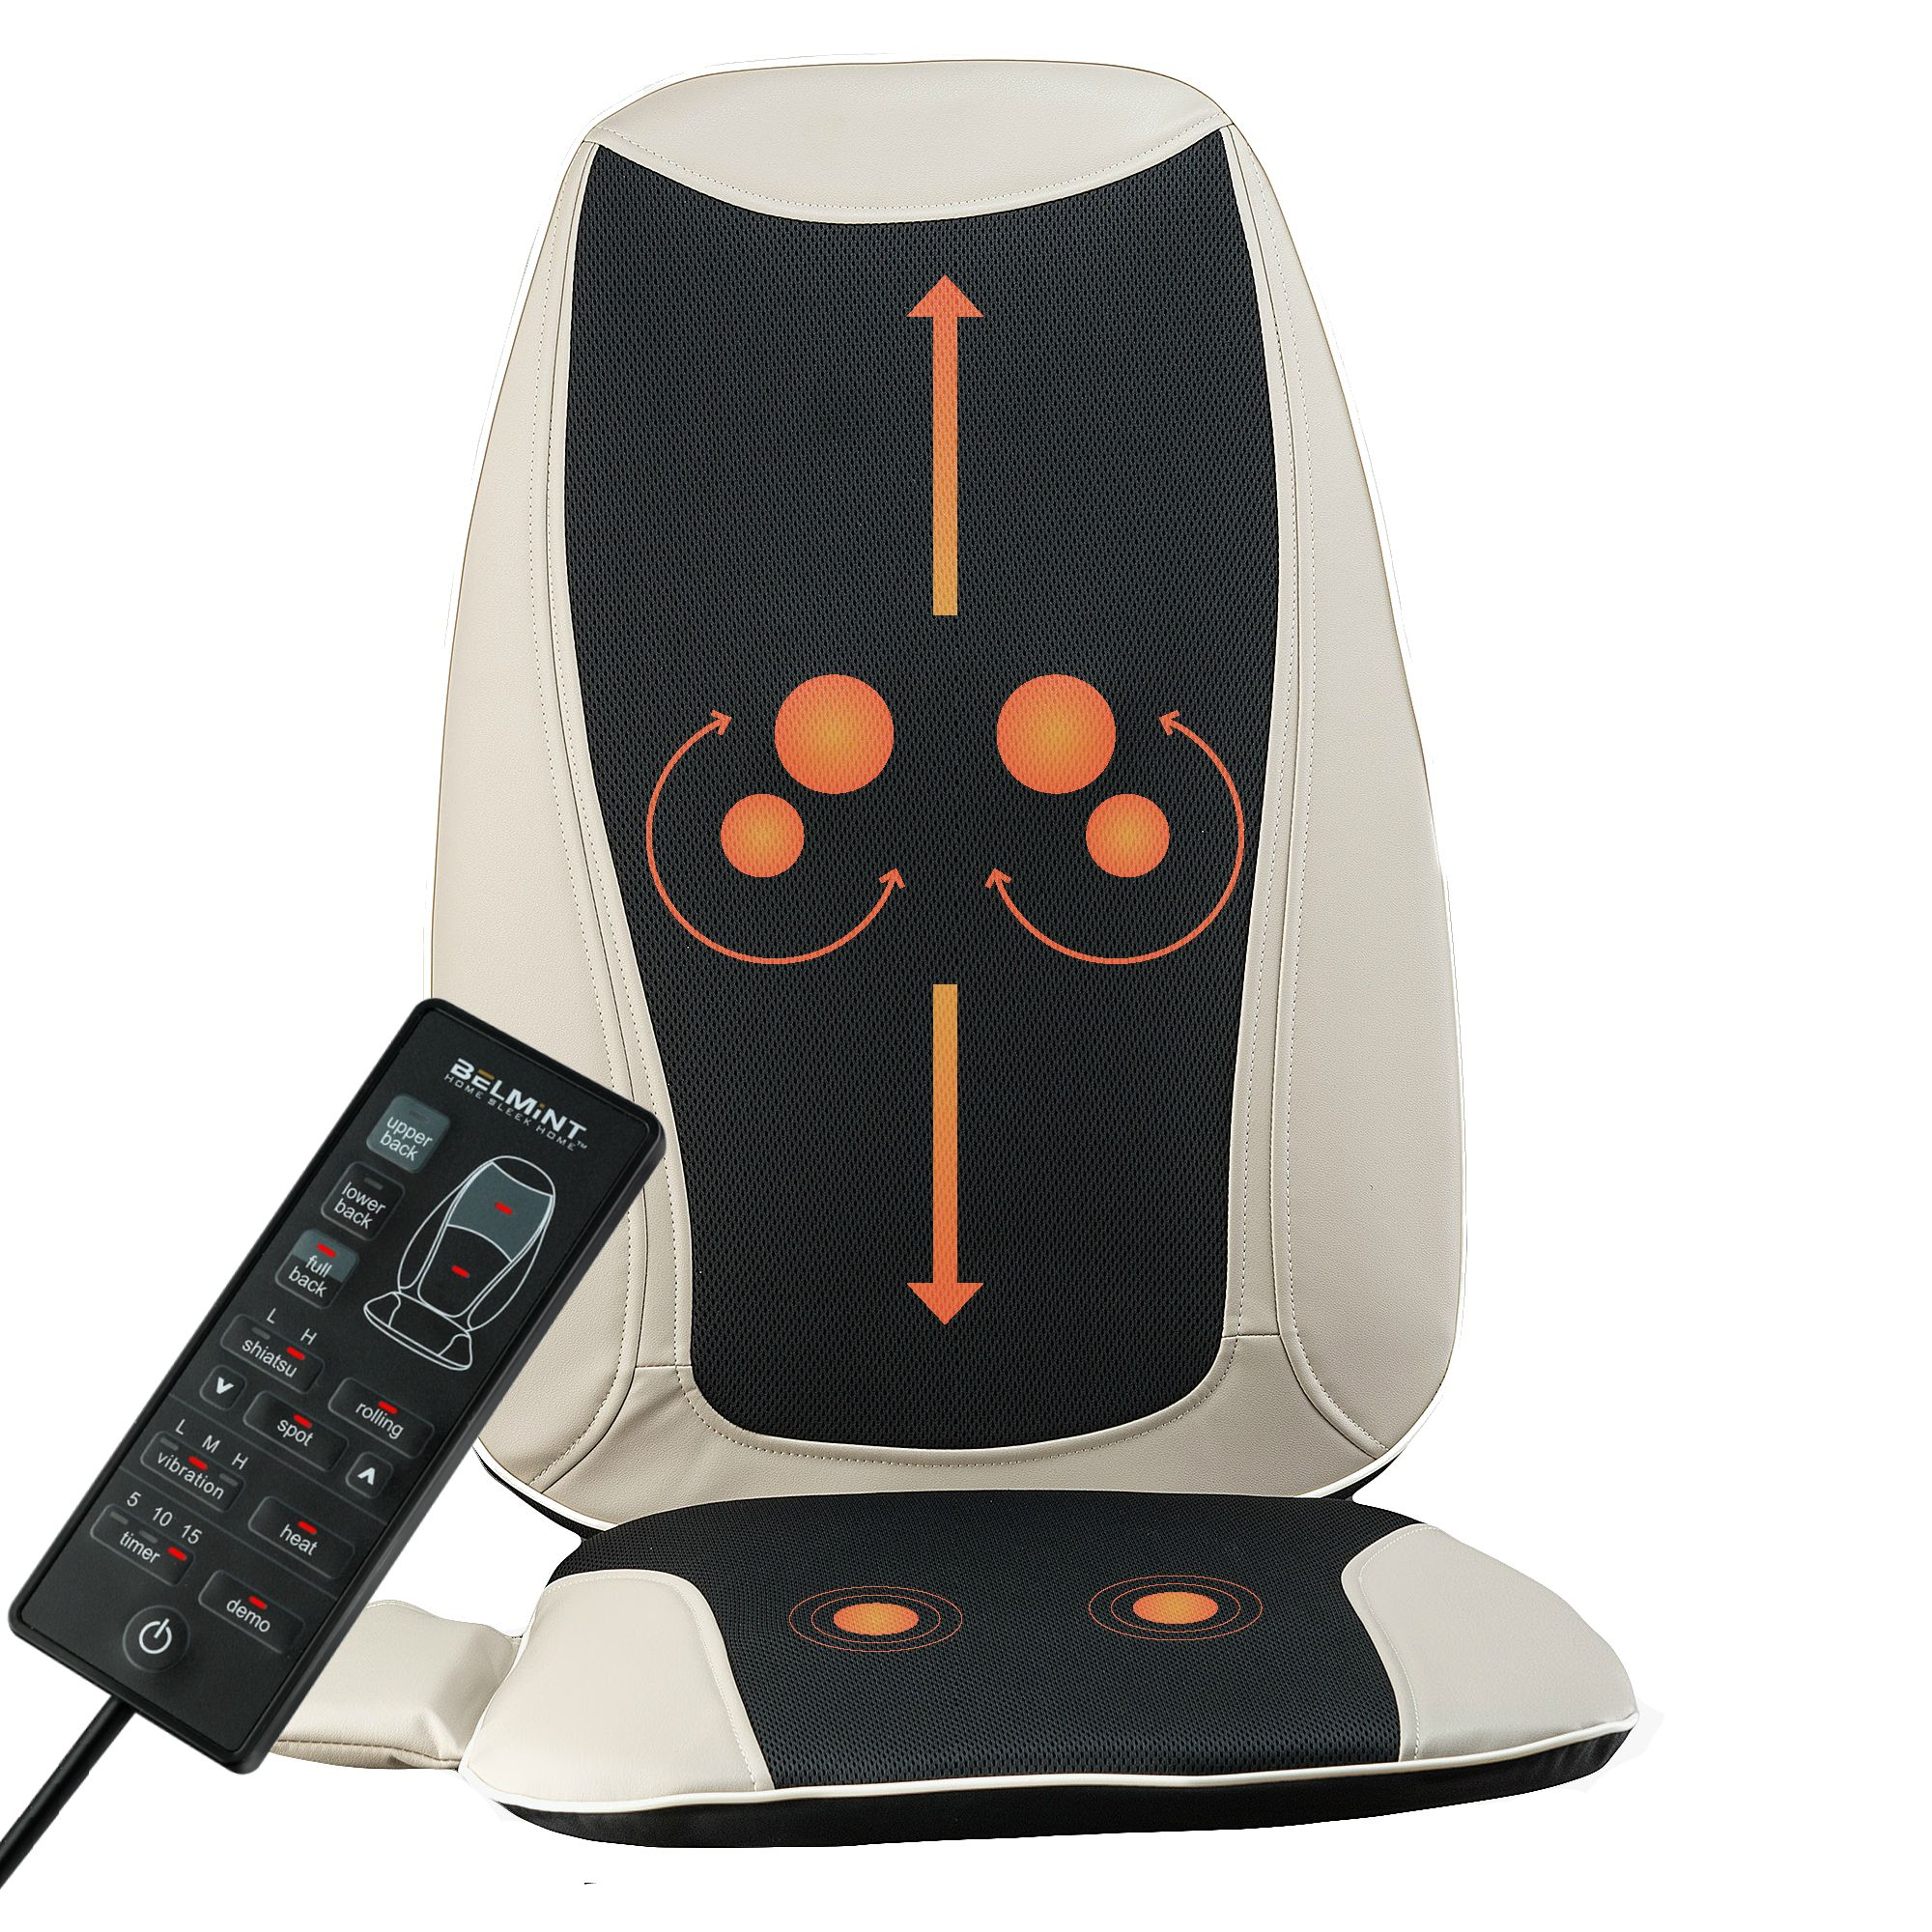 Belmint Seat Cushion Massager With Shiatsu Vibration And Heat Walmart Com In 2020 Shiatsu Massage Chair Shiatsu Massage Back Massager